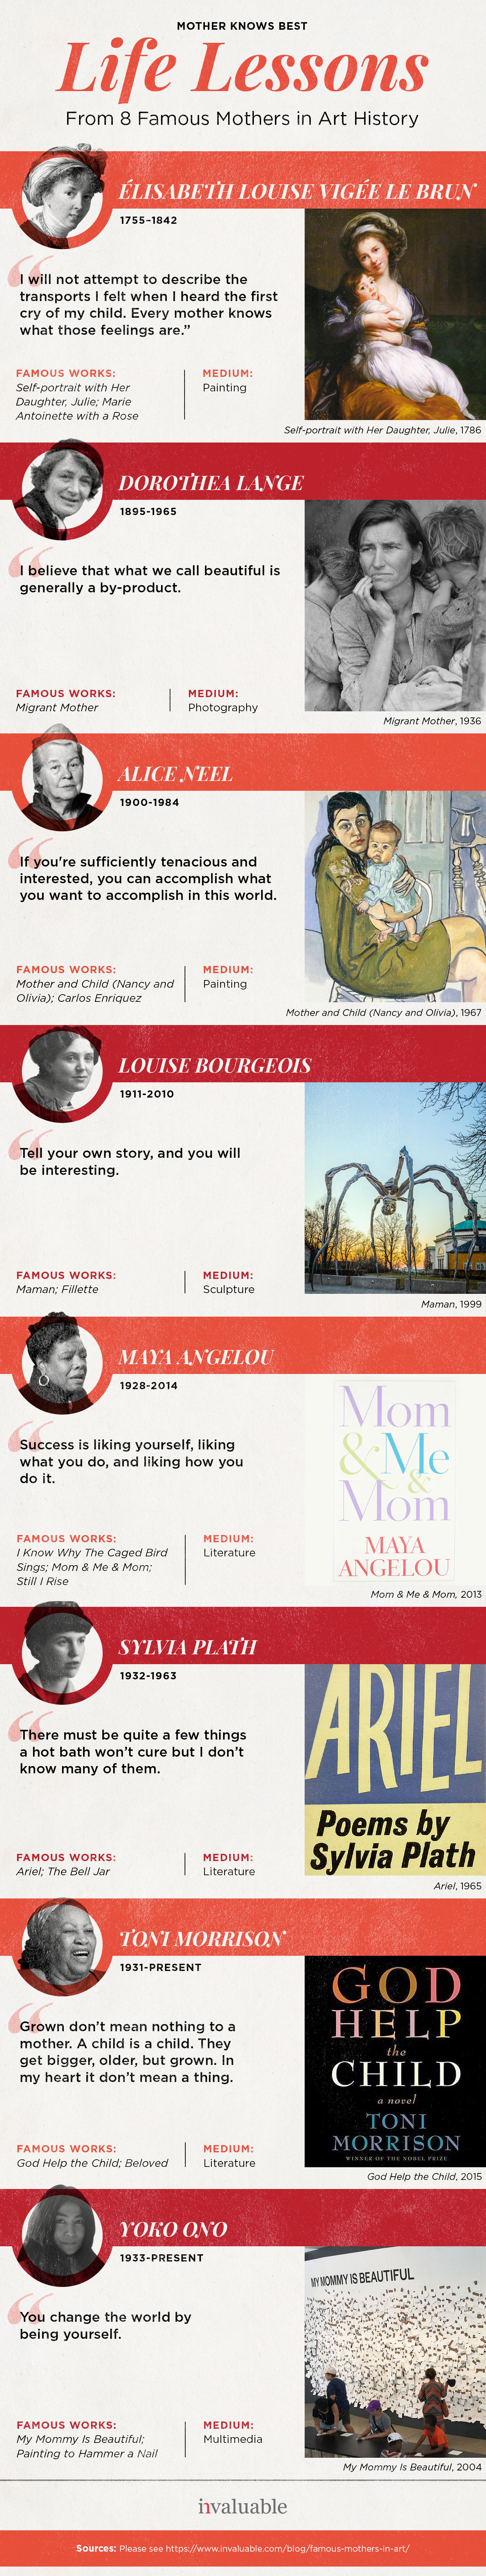 infographic-famous-moms-in-art-history.jpg